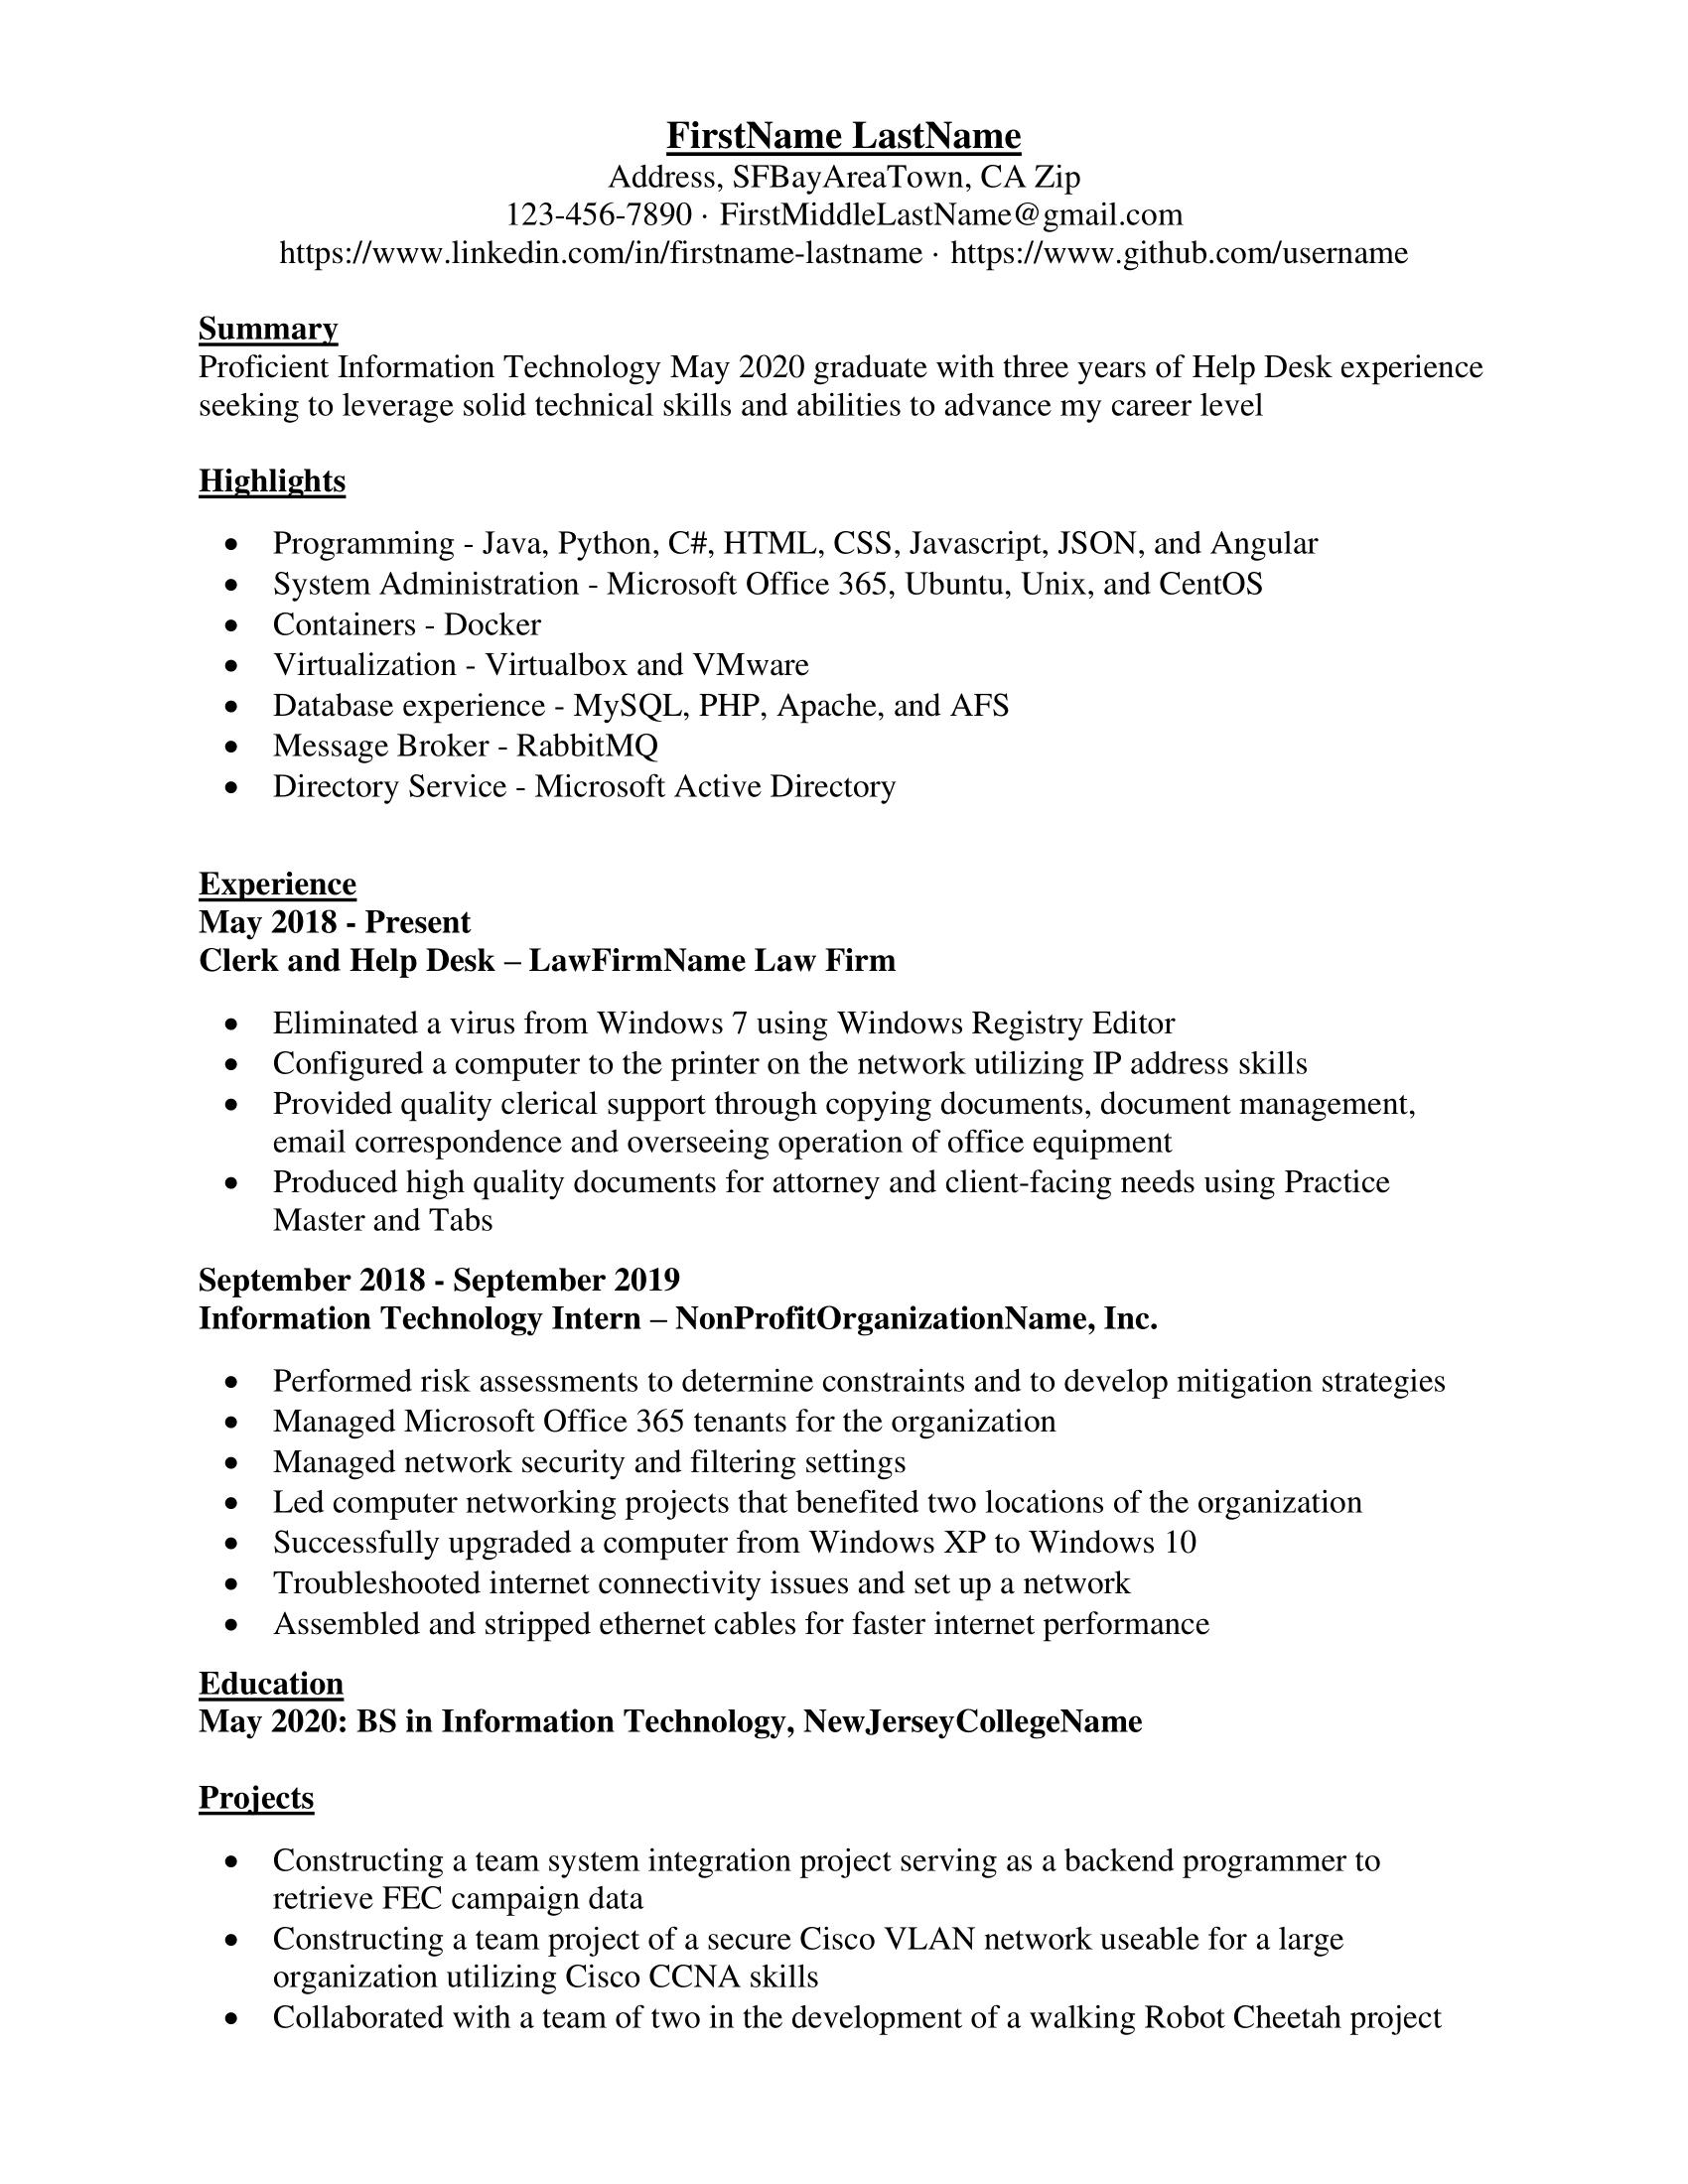 Regular resume before rezi optimisation